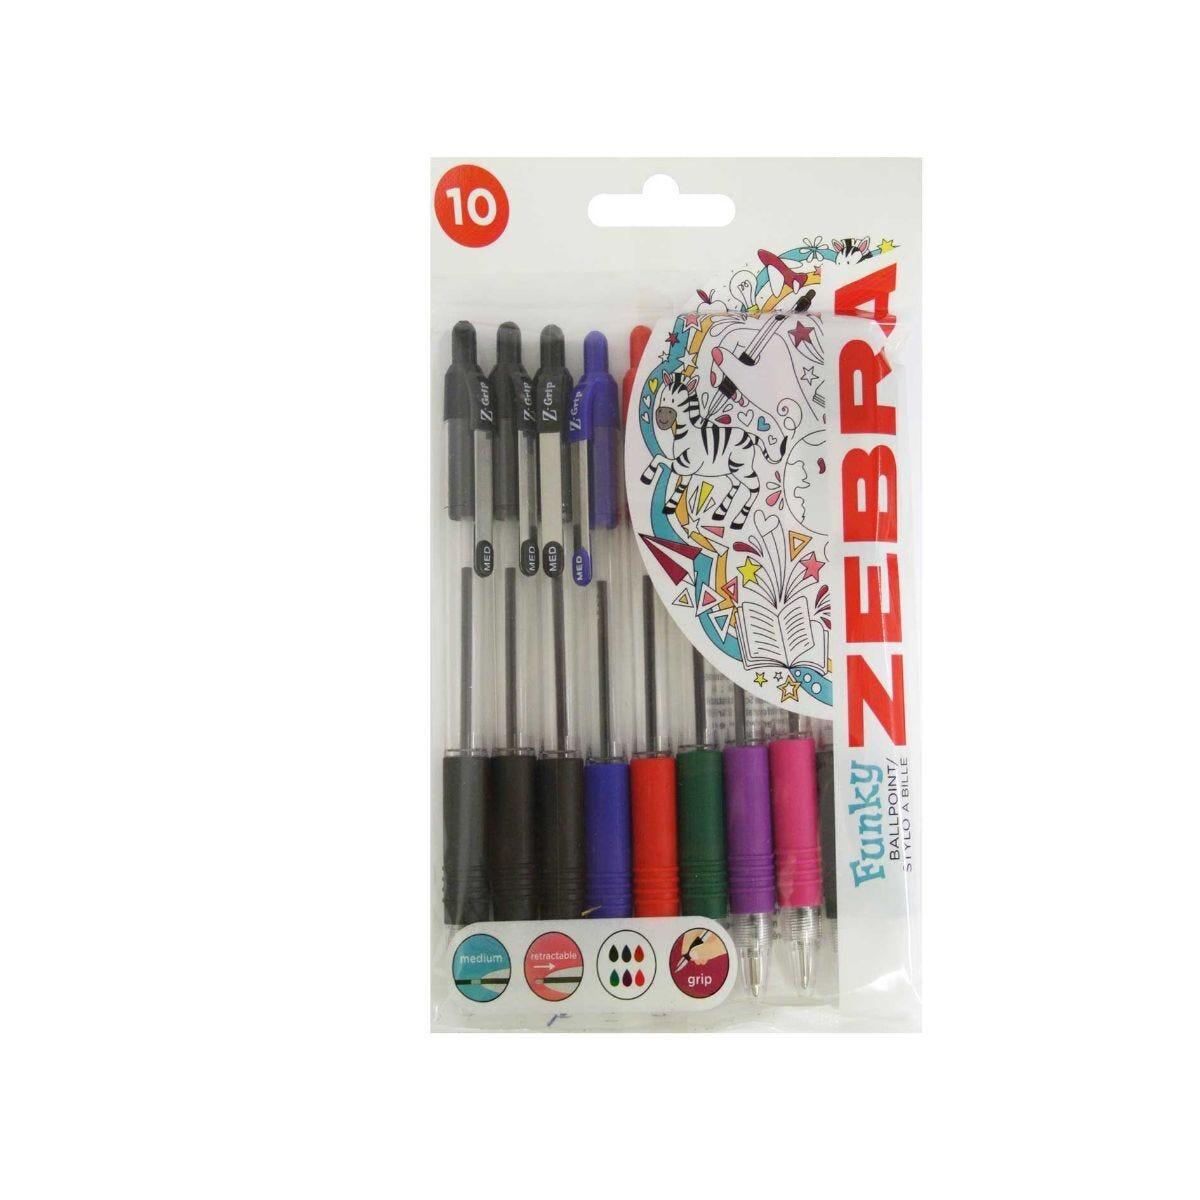 Zebra Z-Grip Ballpoint Pen Pack of 10 Assorted